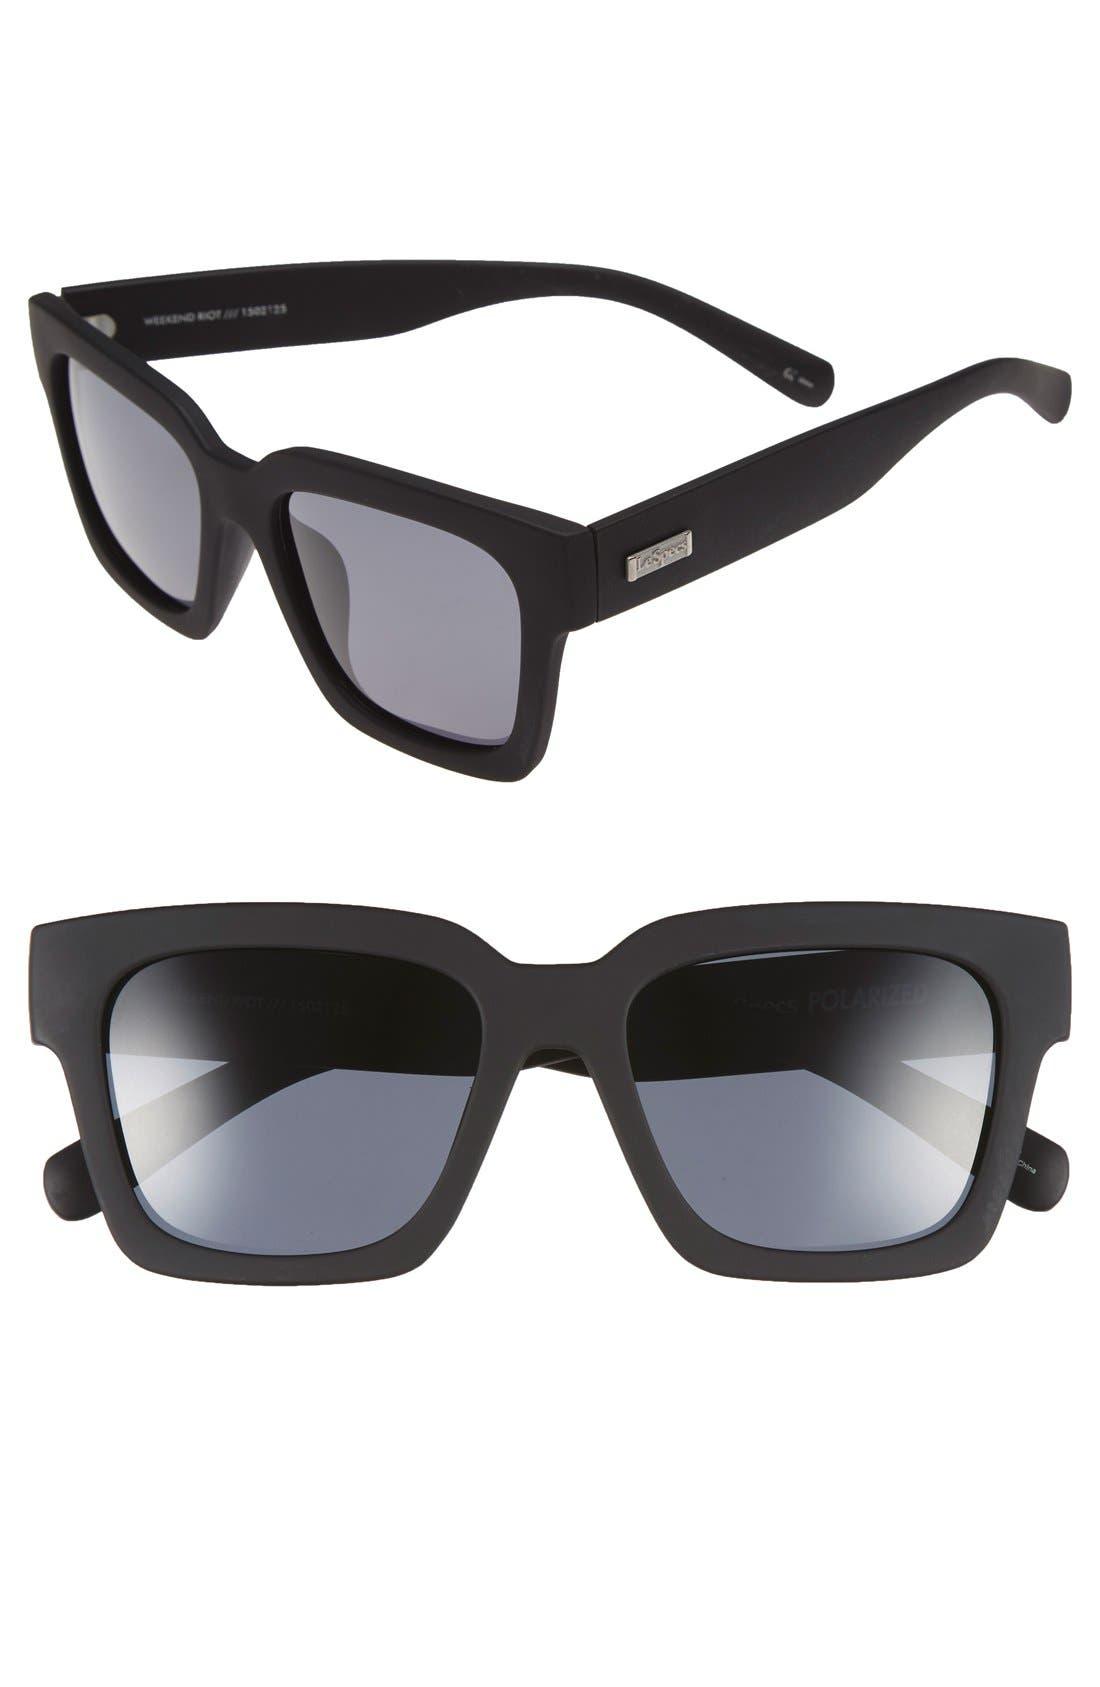 Main Image - Le Specs 'Weekend Riot' 55mm Sunglasses